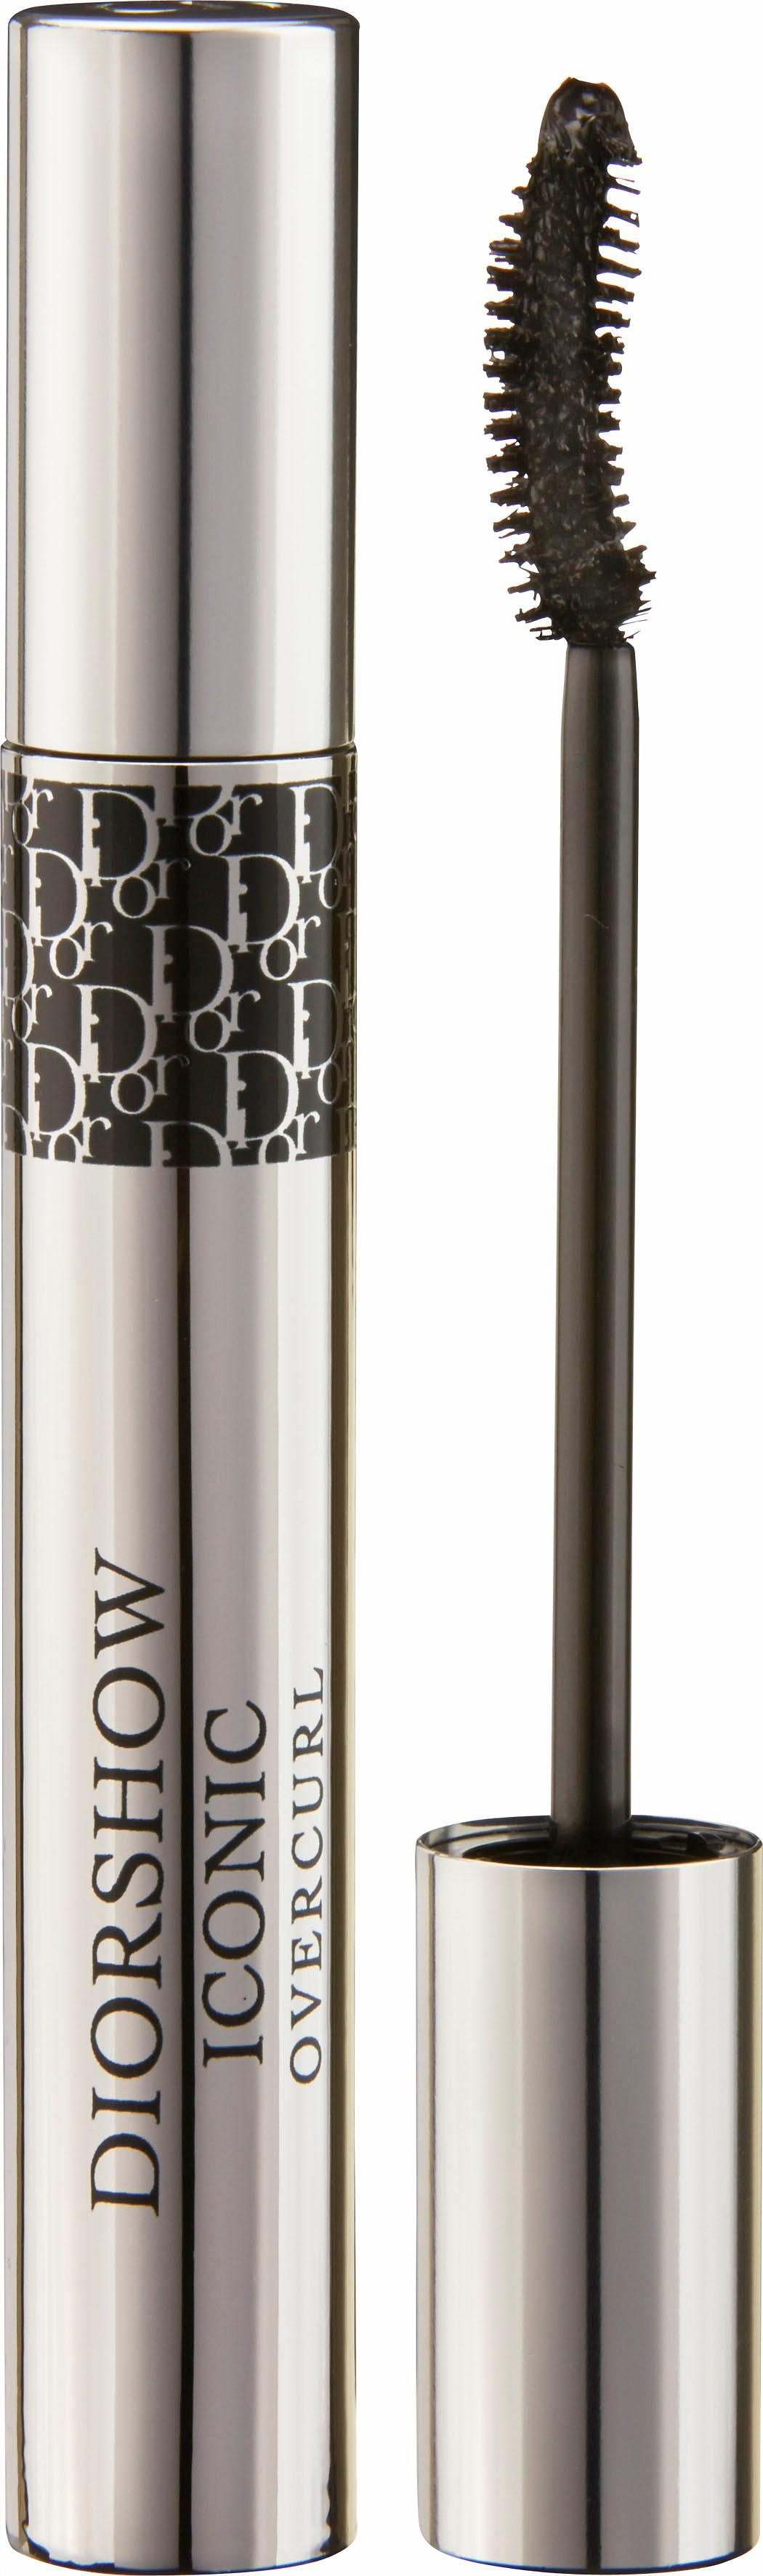 Dior, »Diorshow Iconic Overcurl«, Mascara